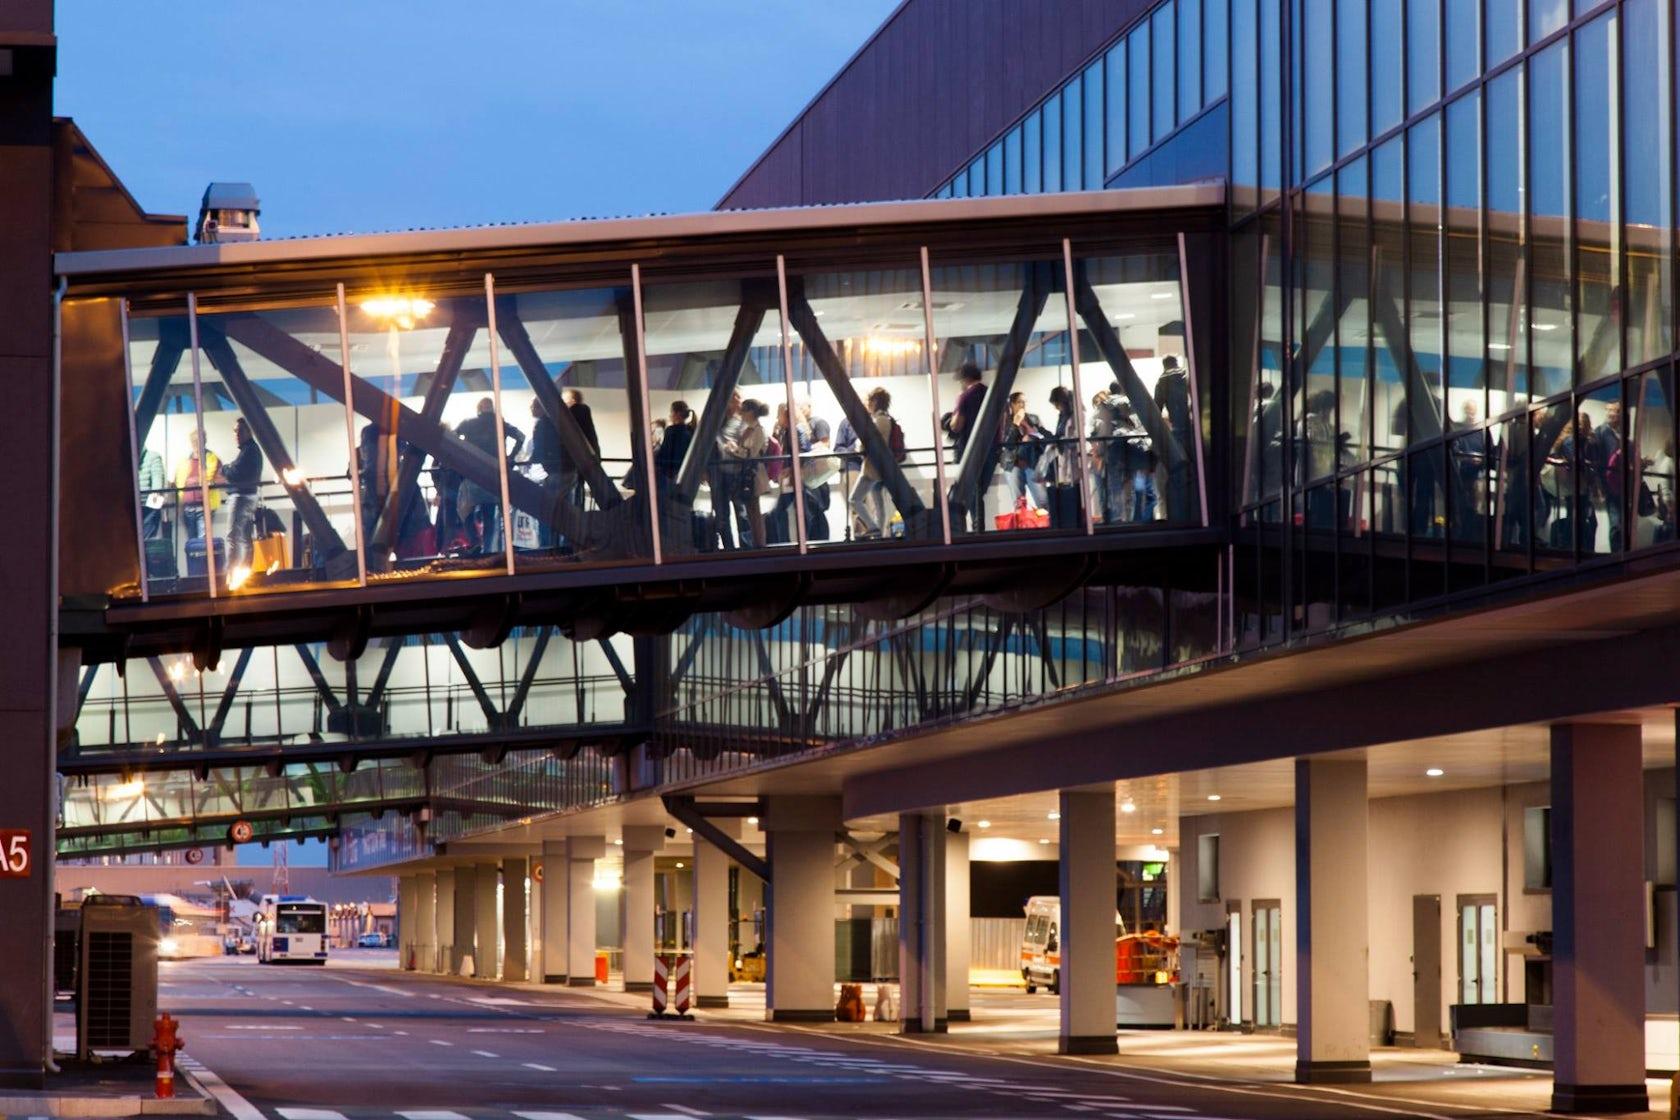 Airport Orio Al Serio : Bergamo orio al serio airport passenger terminal